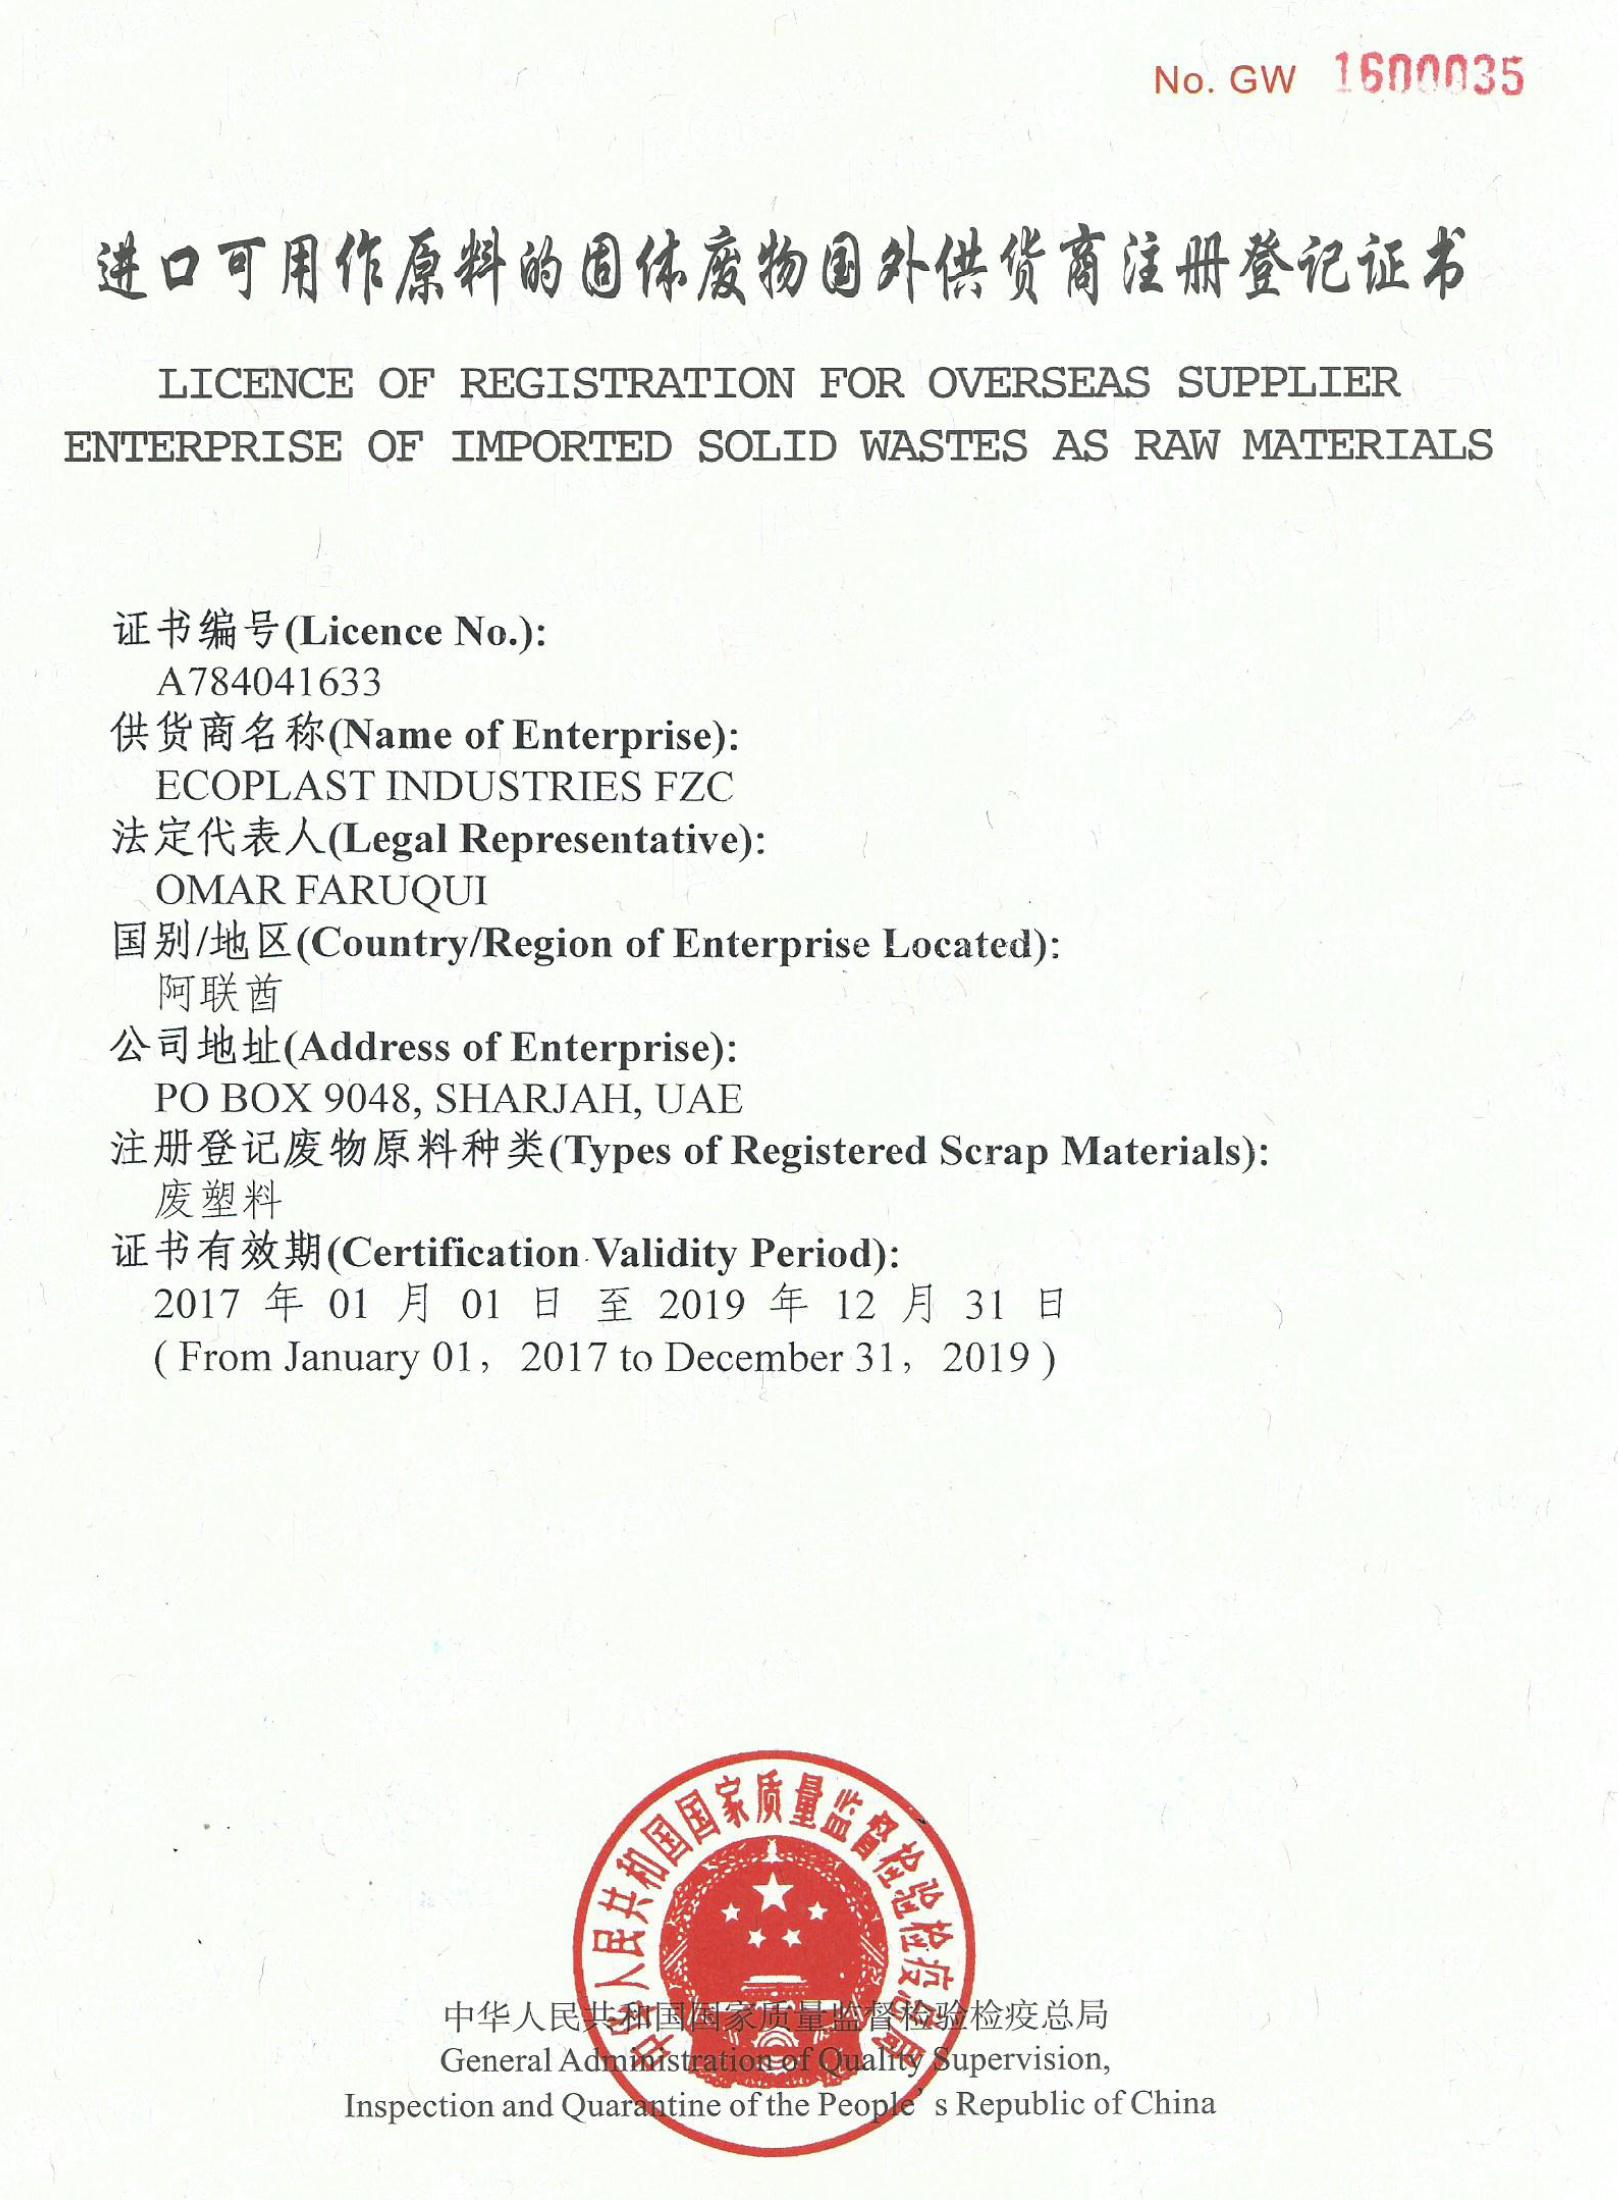 Ecoplast Industries